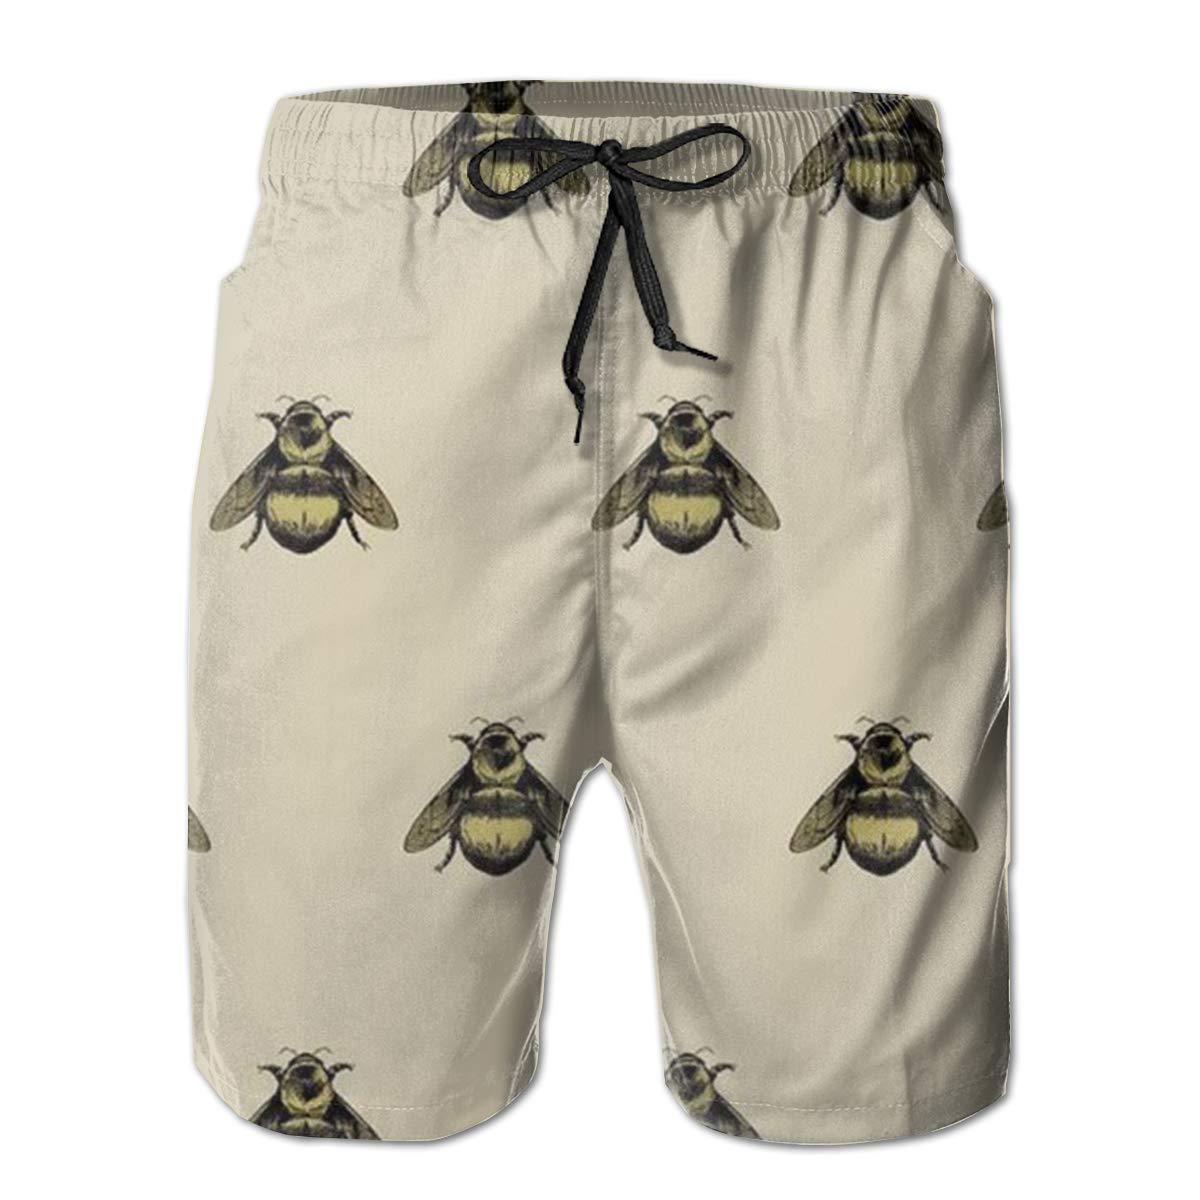 LDFUMG Cartoon Bee Mens Beach Board Shorts Quick Dry Summer Casual Swimming Soft Fabric with Pocket